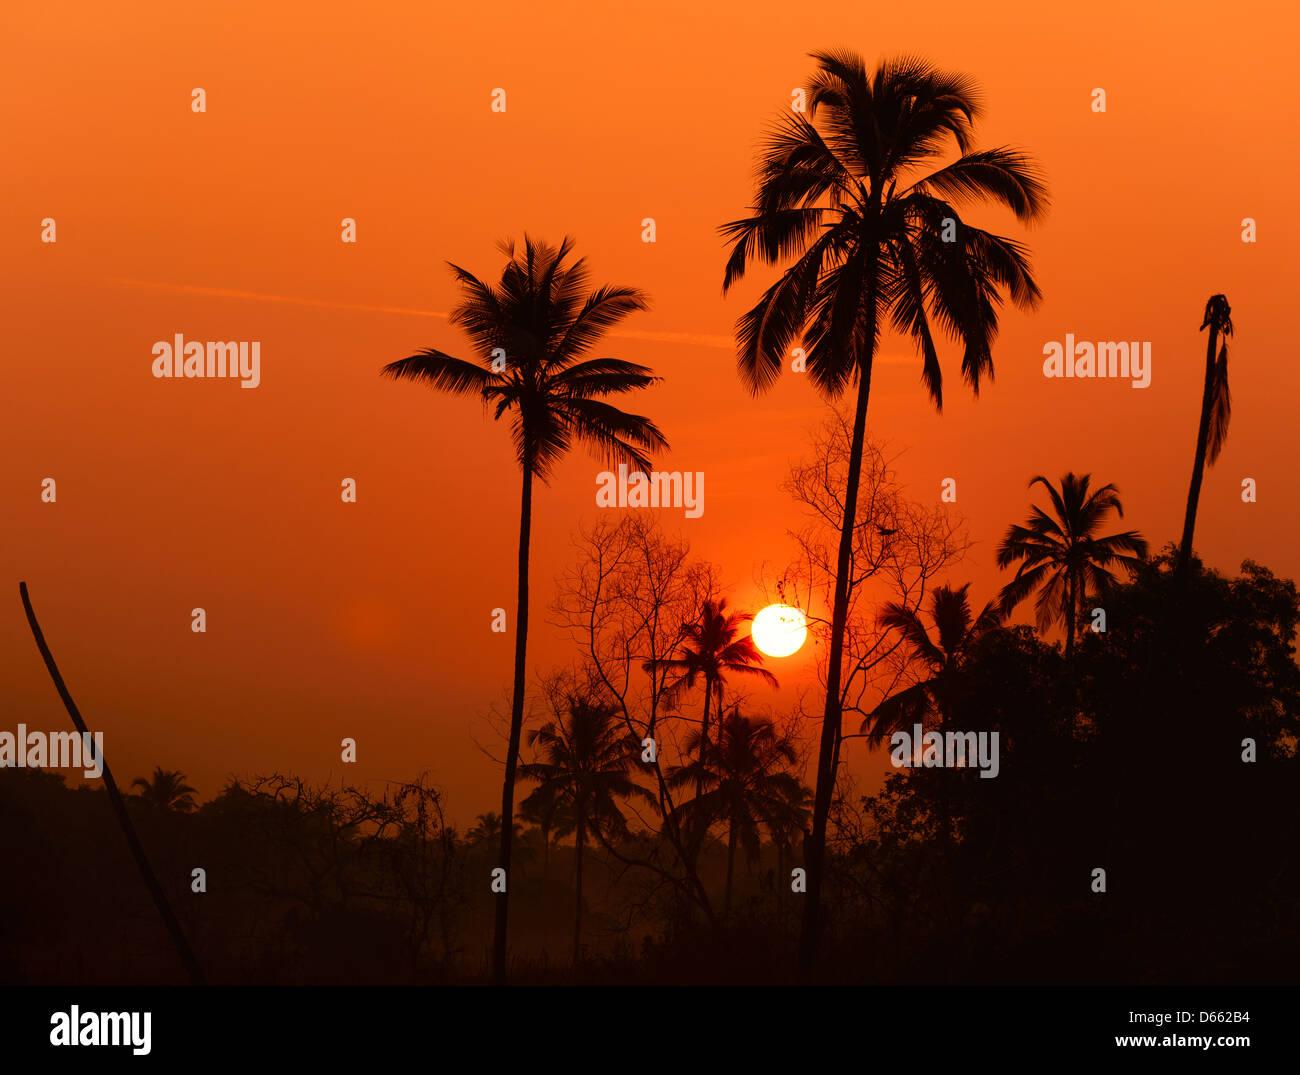 Sonnenaufgang im Dorf Tamborim in Süd-Goa, Indien Stockbild